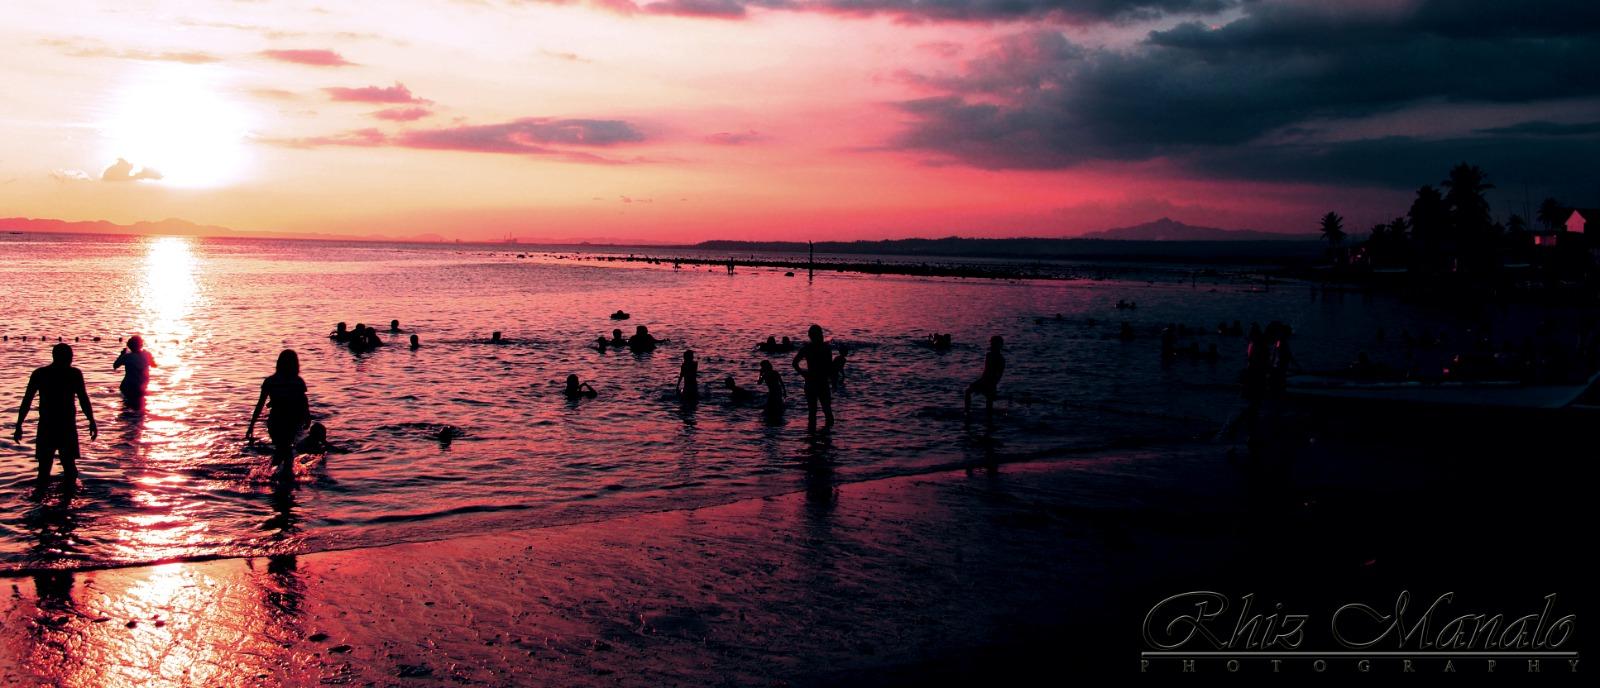 Dreamlike sunset